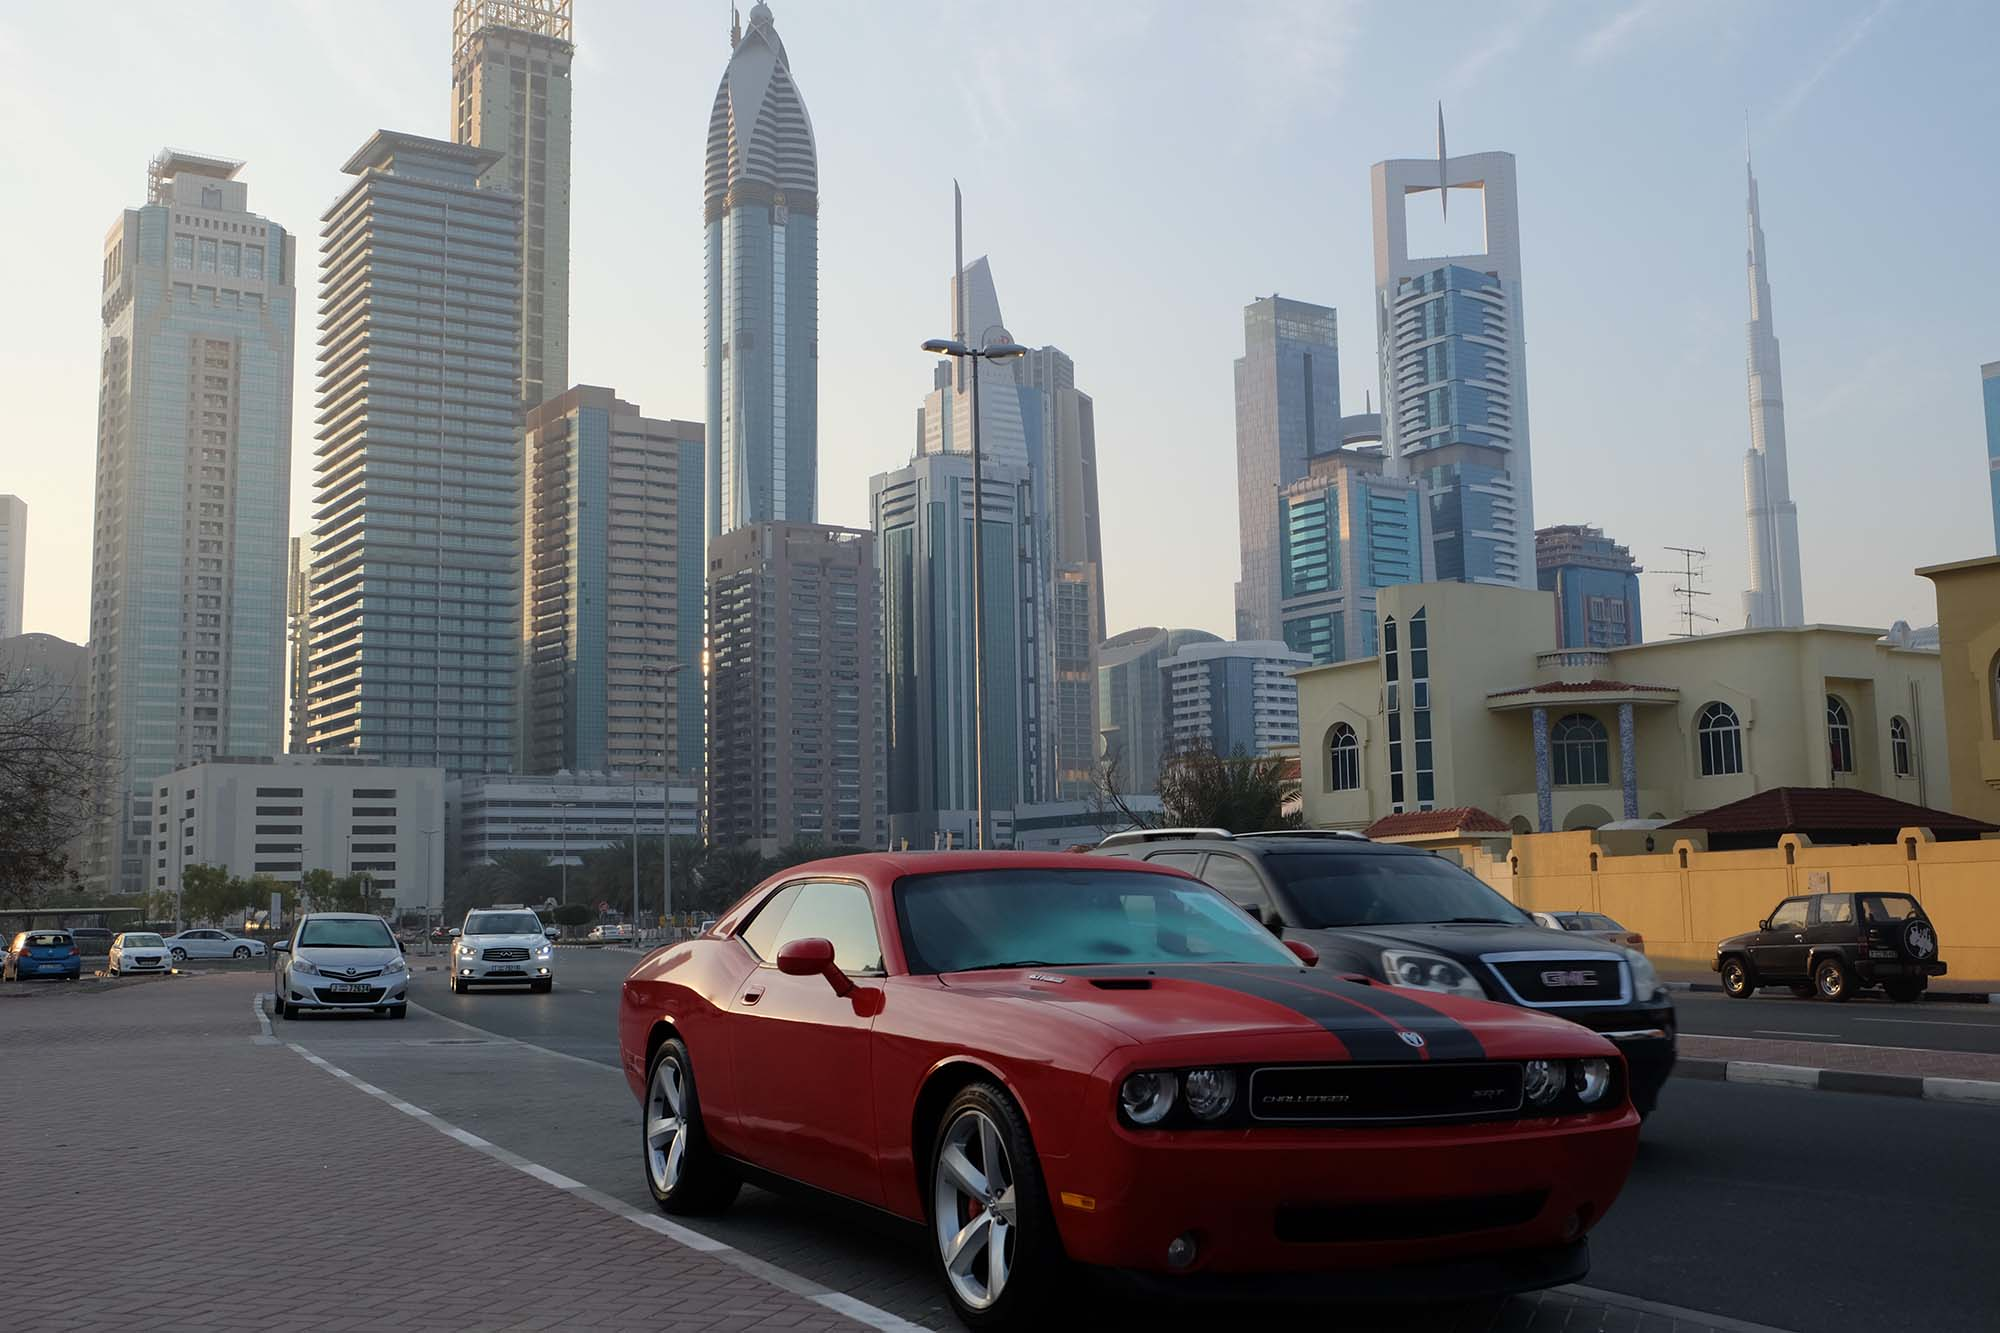 emirates guardians of time manfred kili kielnhofer car antique art sculpture contemporary arts fine modern design statue art tour faceless love religion freedom 9120